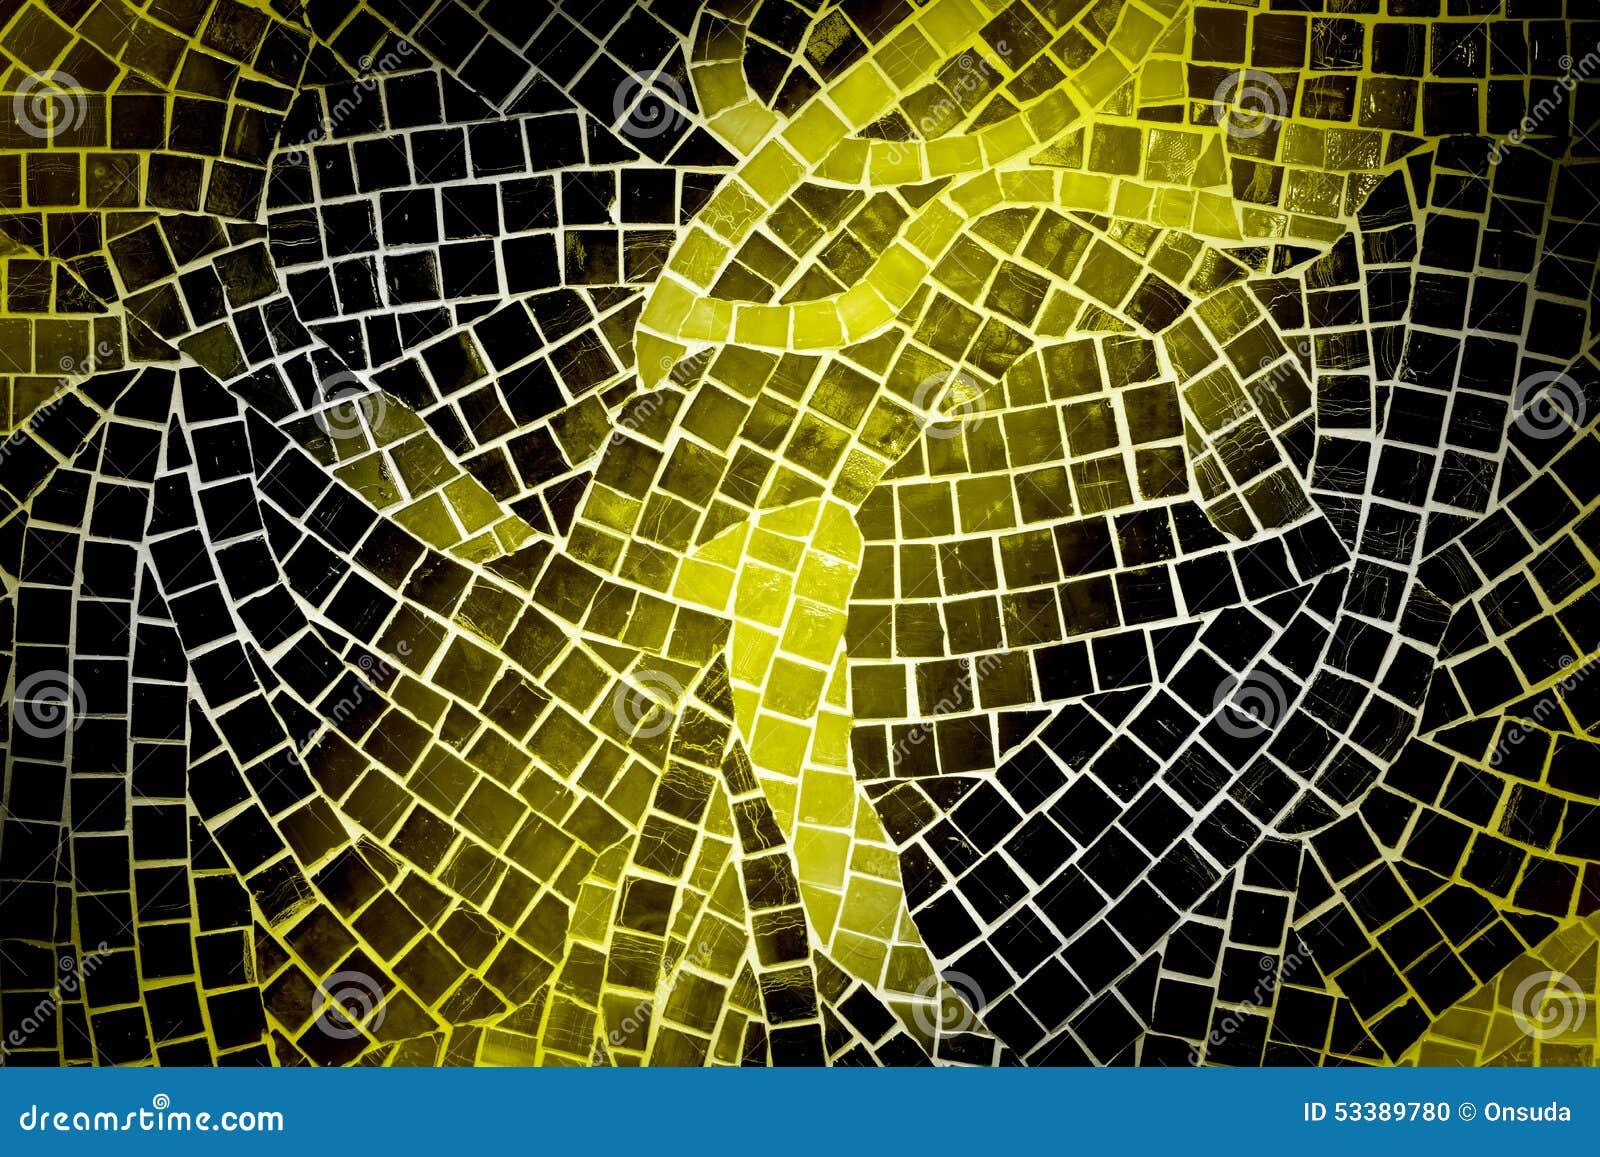 Yellow And Black Mosaic Tile Wall Stock Photo - Image of interior ...